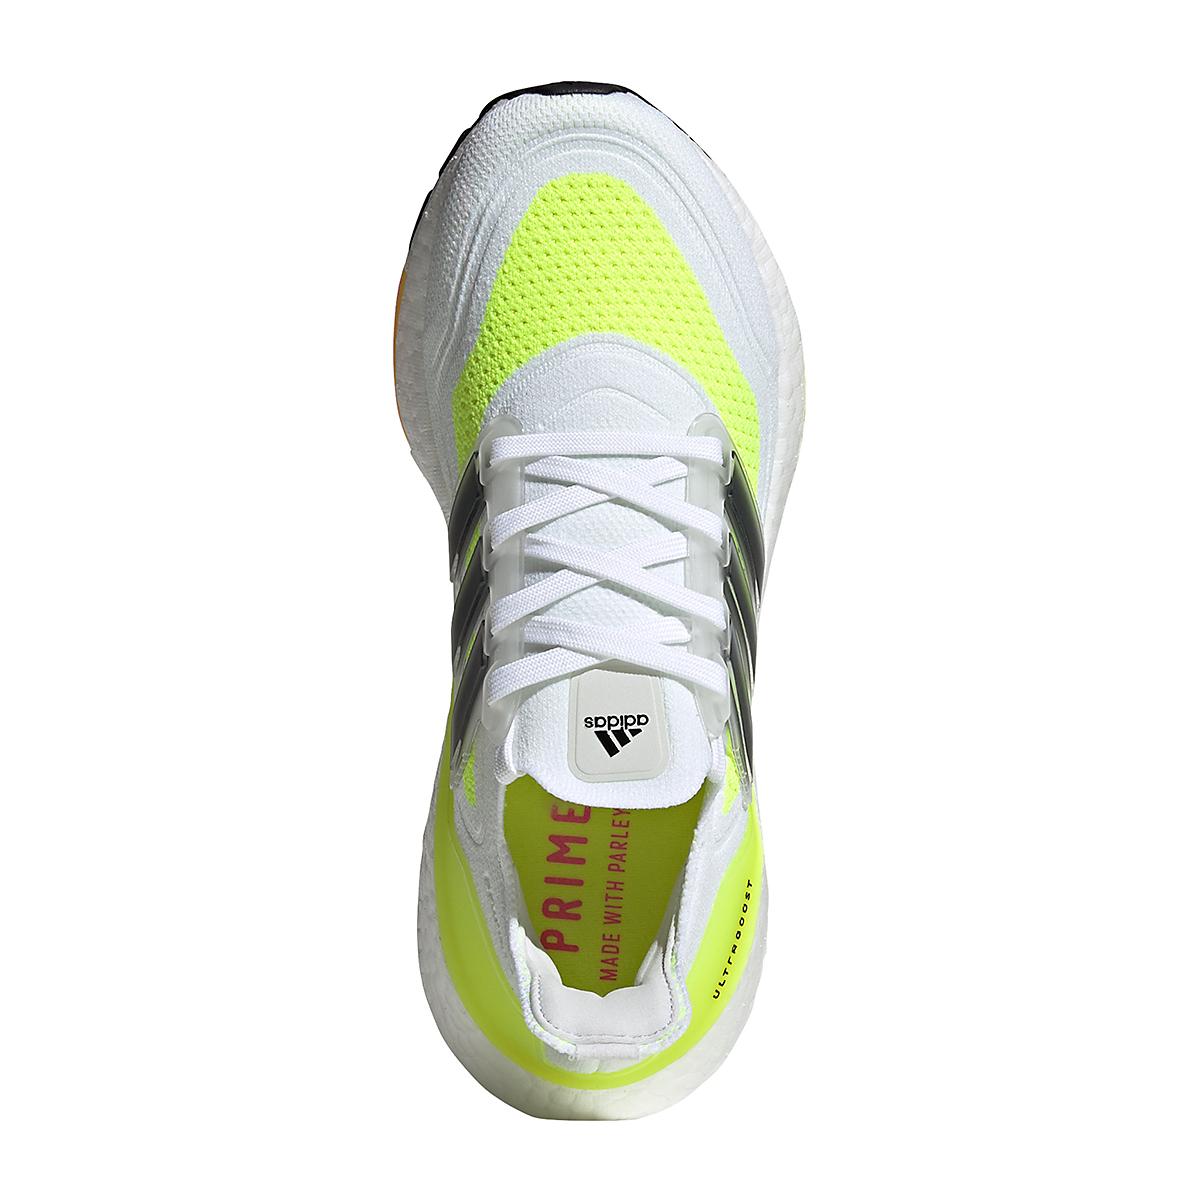 Women's Adidas Ultraboost 21 Running Shoe - Color: Cloud White/Black/Solar Yellow - Size: 5 - Width: Regular, Cloud White/Black/Solar Yellow, large, image 6